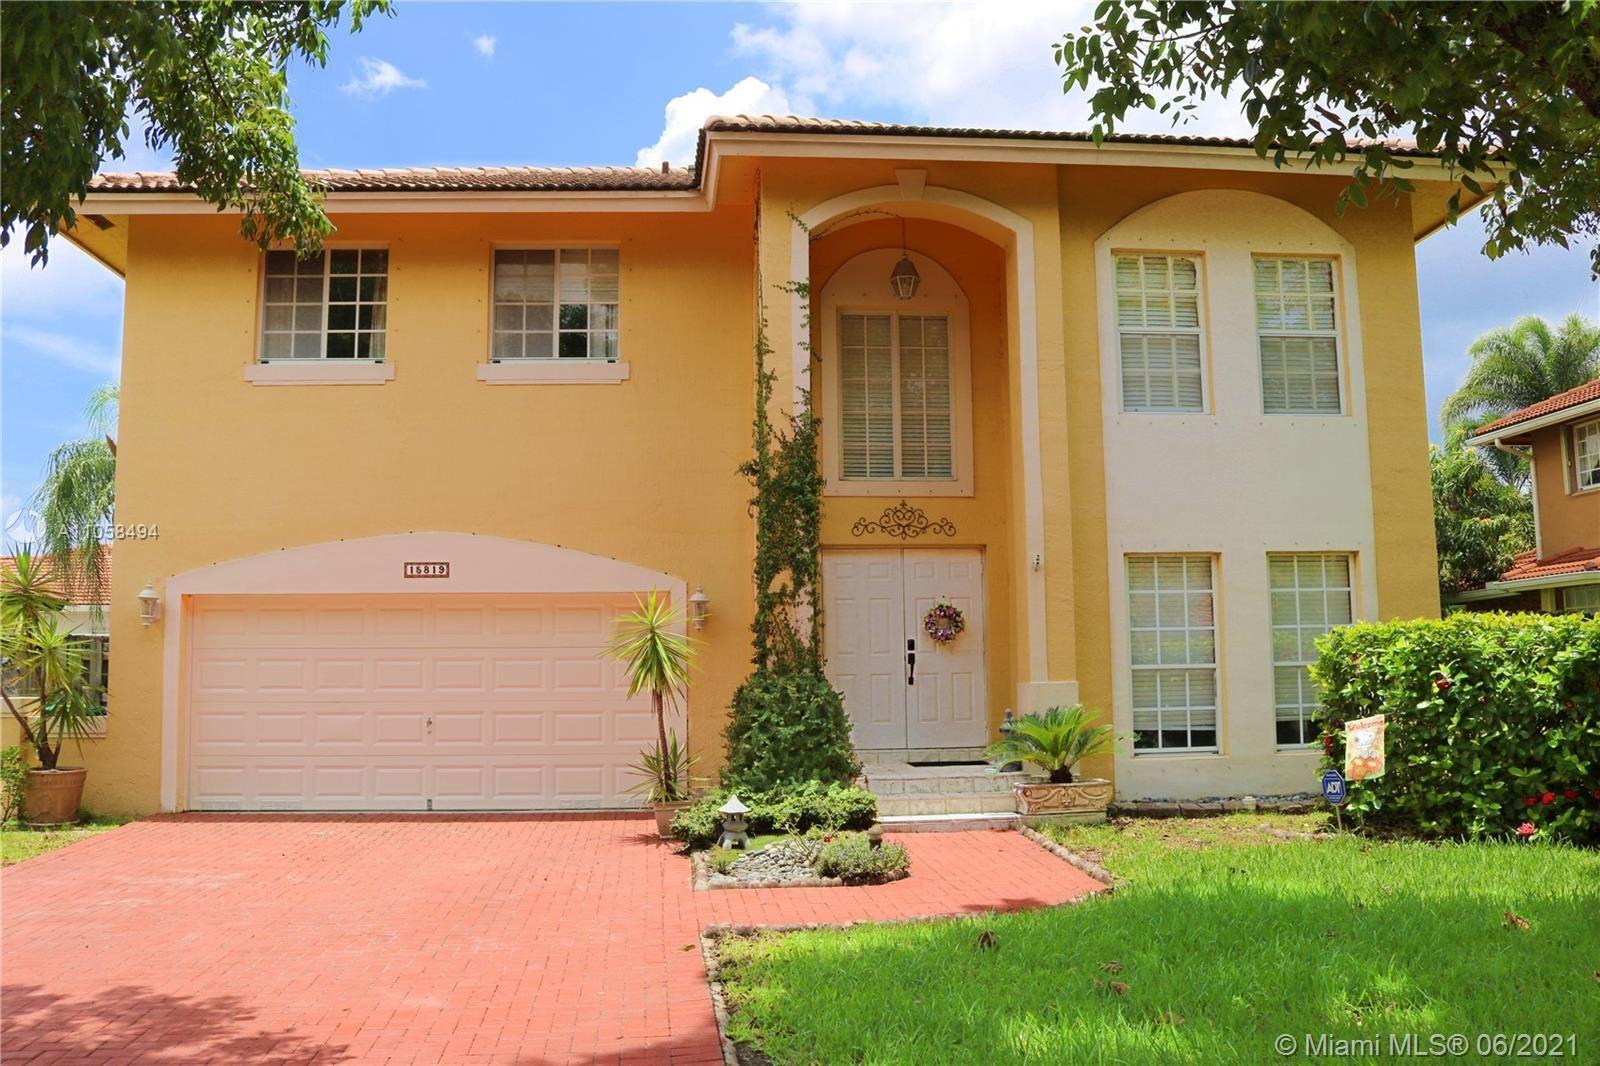 Photo of 15819 SW 99th St, Miami, FL 33196 (MLS # A11058494)